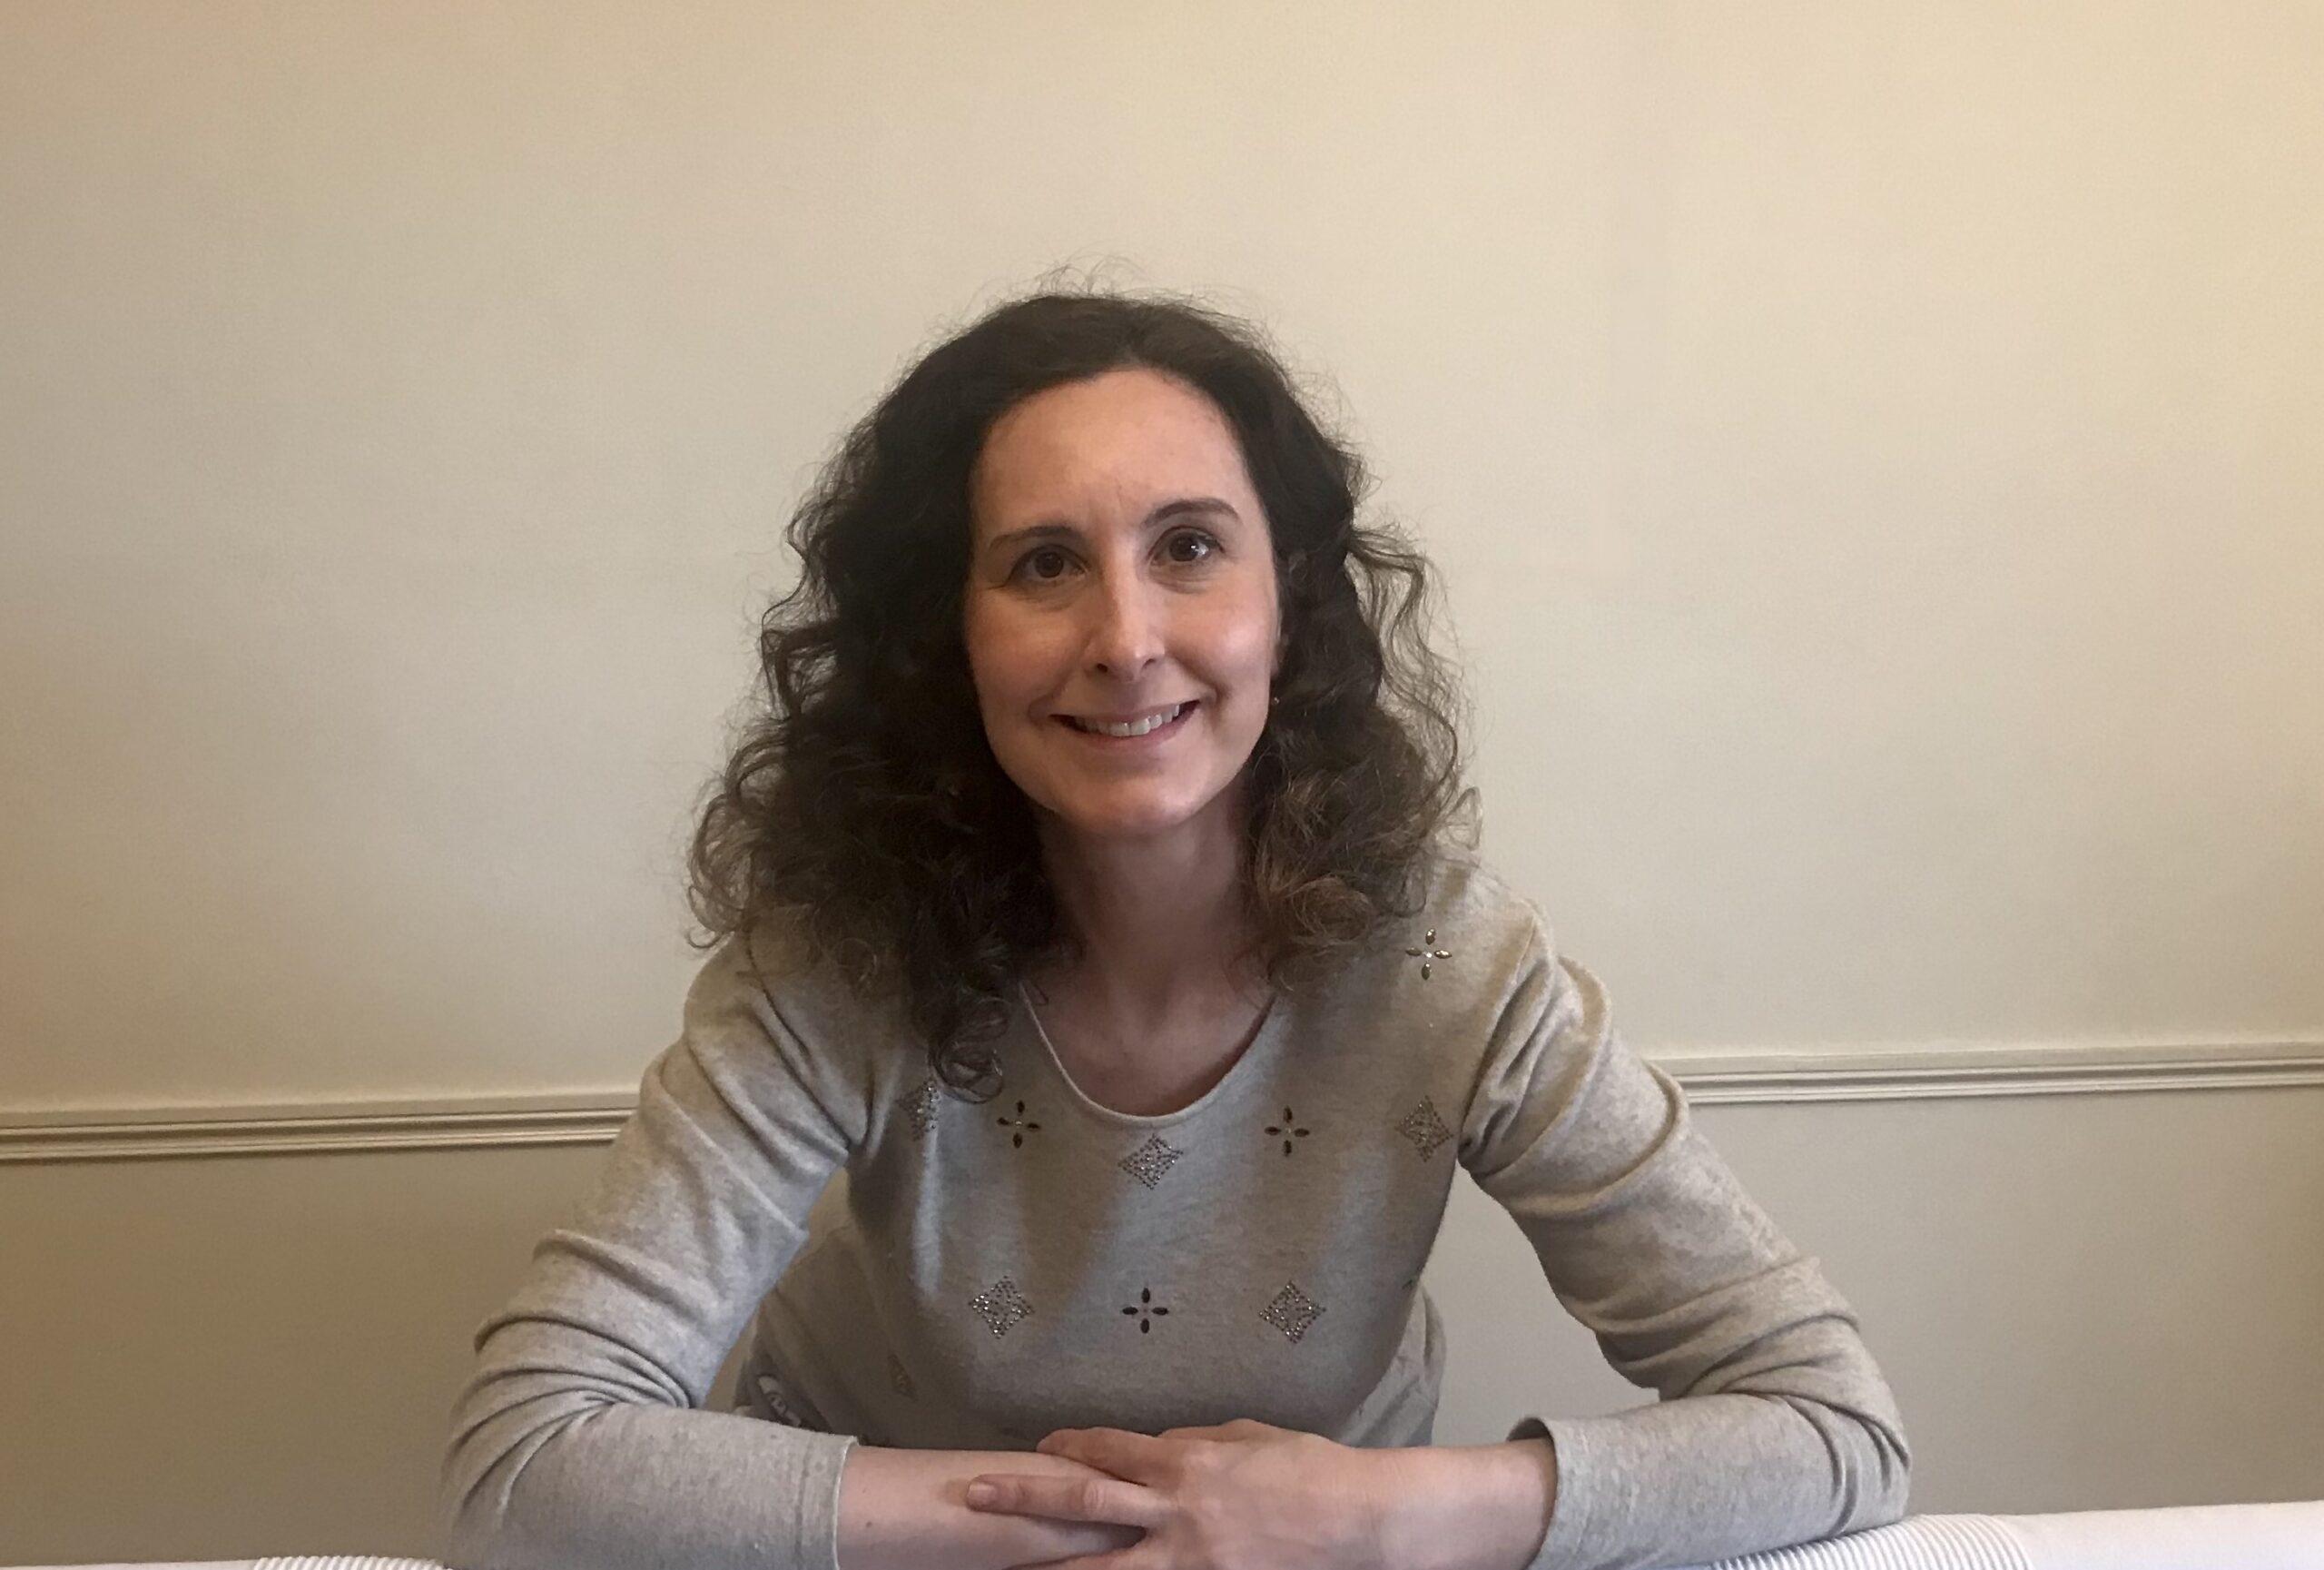 Cristina Reus